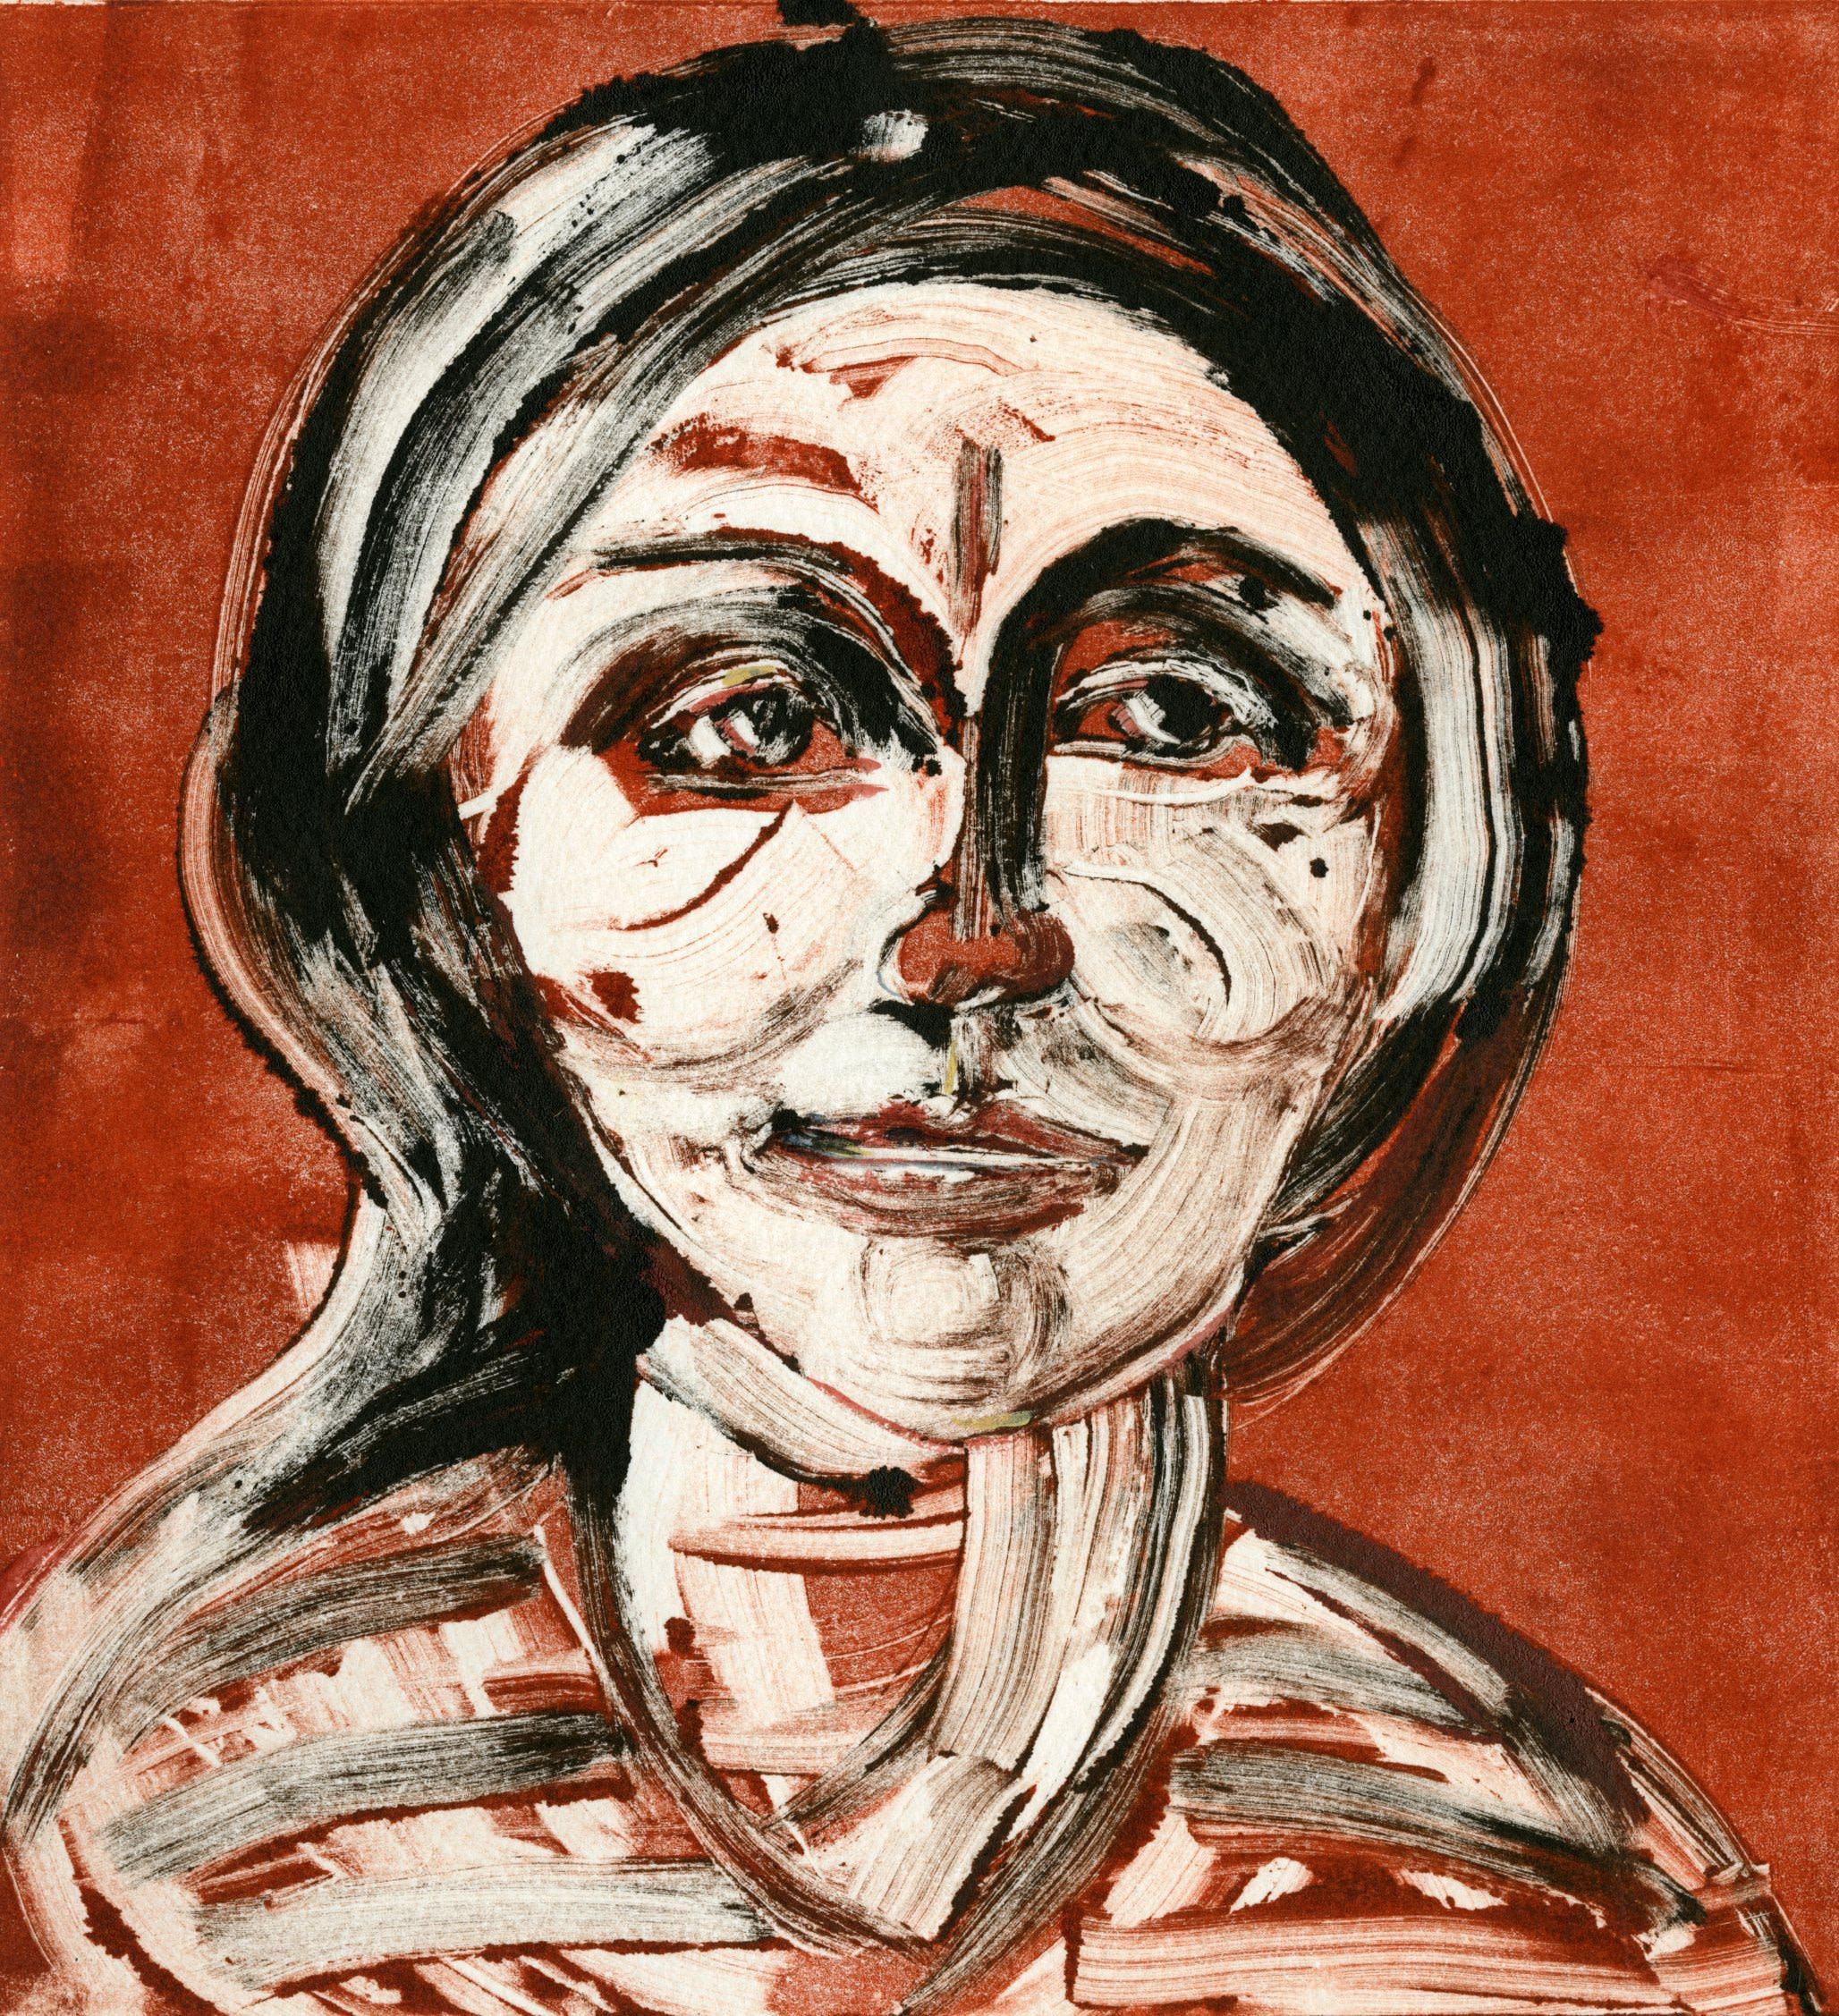 "<span class=""link fancybox-details-link""><a href=""/artists/102-julia-midgley-rws-re/works/10908/"">View Detail Page</a></span><div class=""artist""><span class=""artist""><strong>Julia Midgley RWS RE</strong></span></div><div class=""title""><em>Portrait B&Q Queue</em></div><div class=""medium"">monoprint</div><div class=""dimensions"">42 x 32cm framed<br /> 19 x 18cm image</div><div class=""edition_details"">1/1</div><div class=""price"">£275.00</div>"